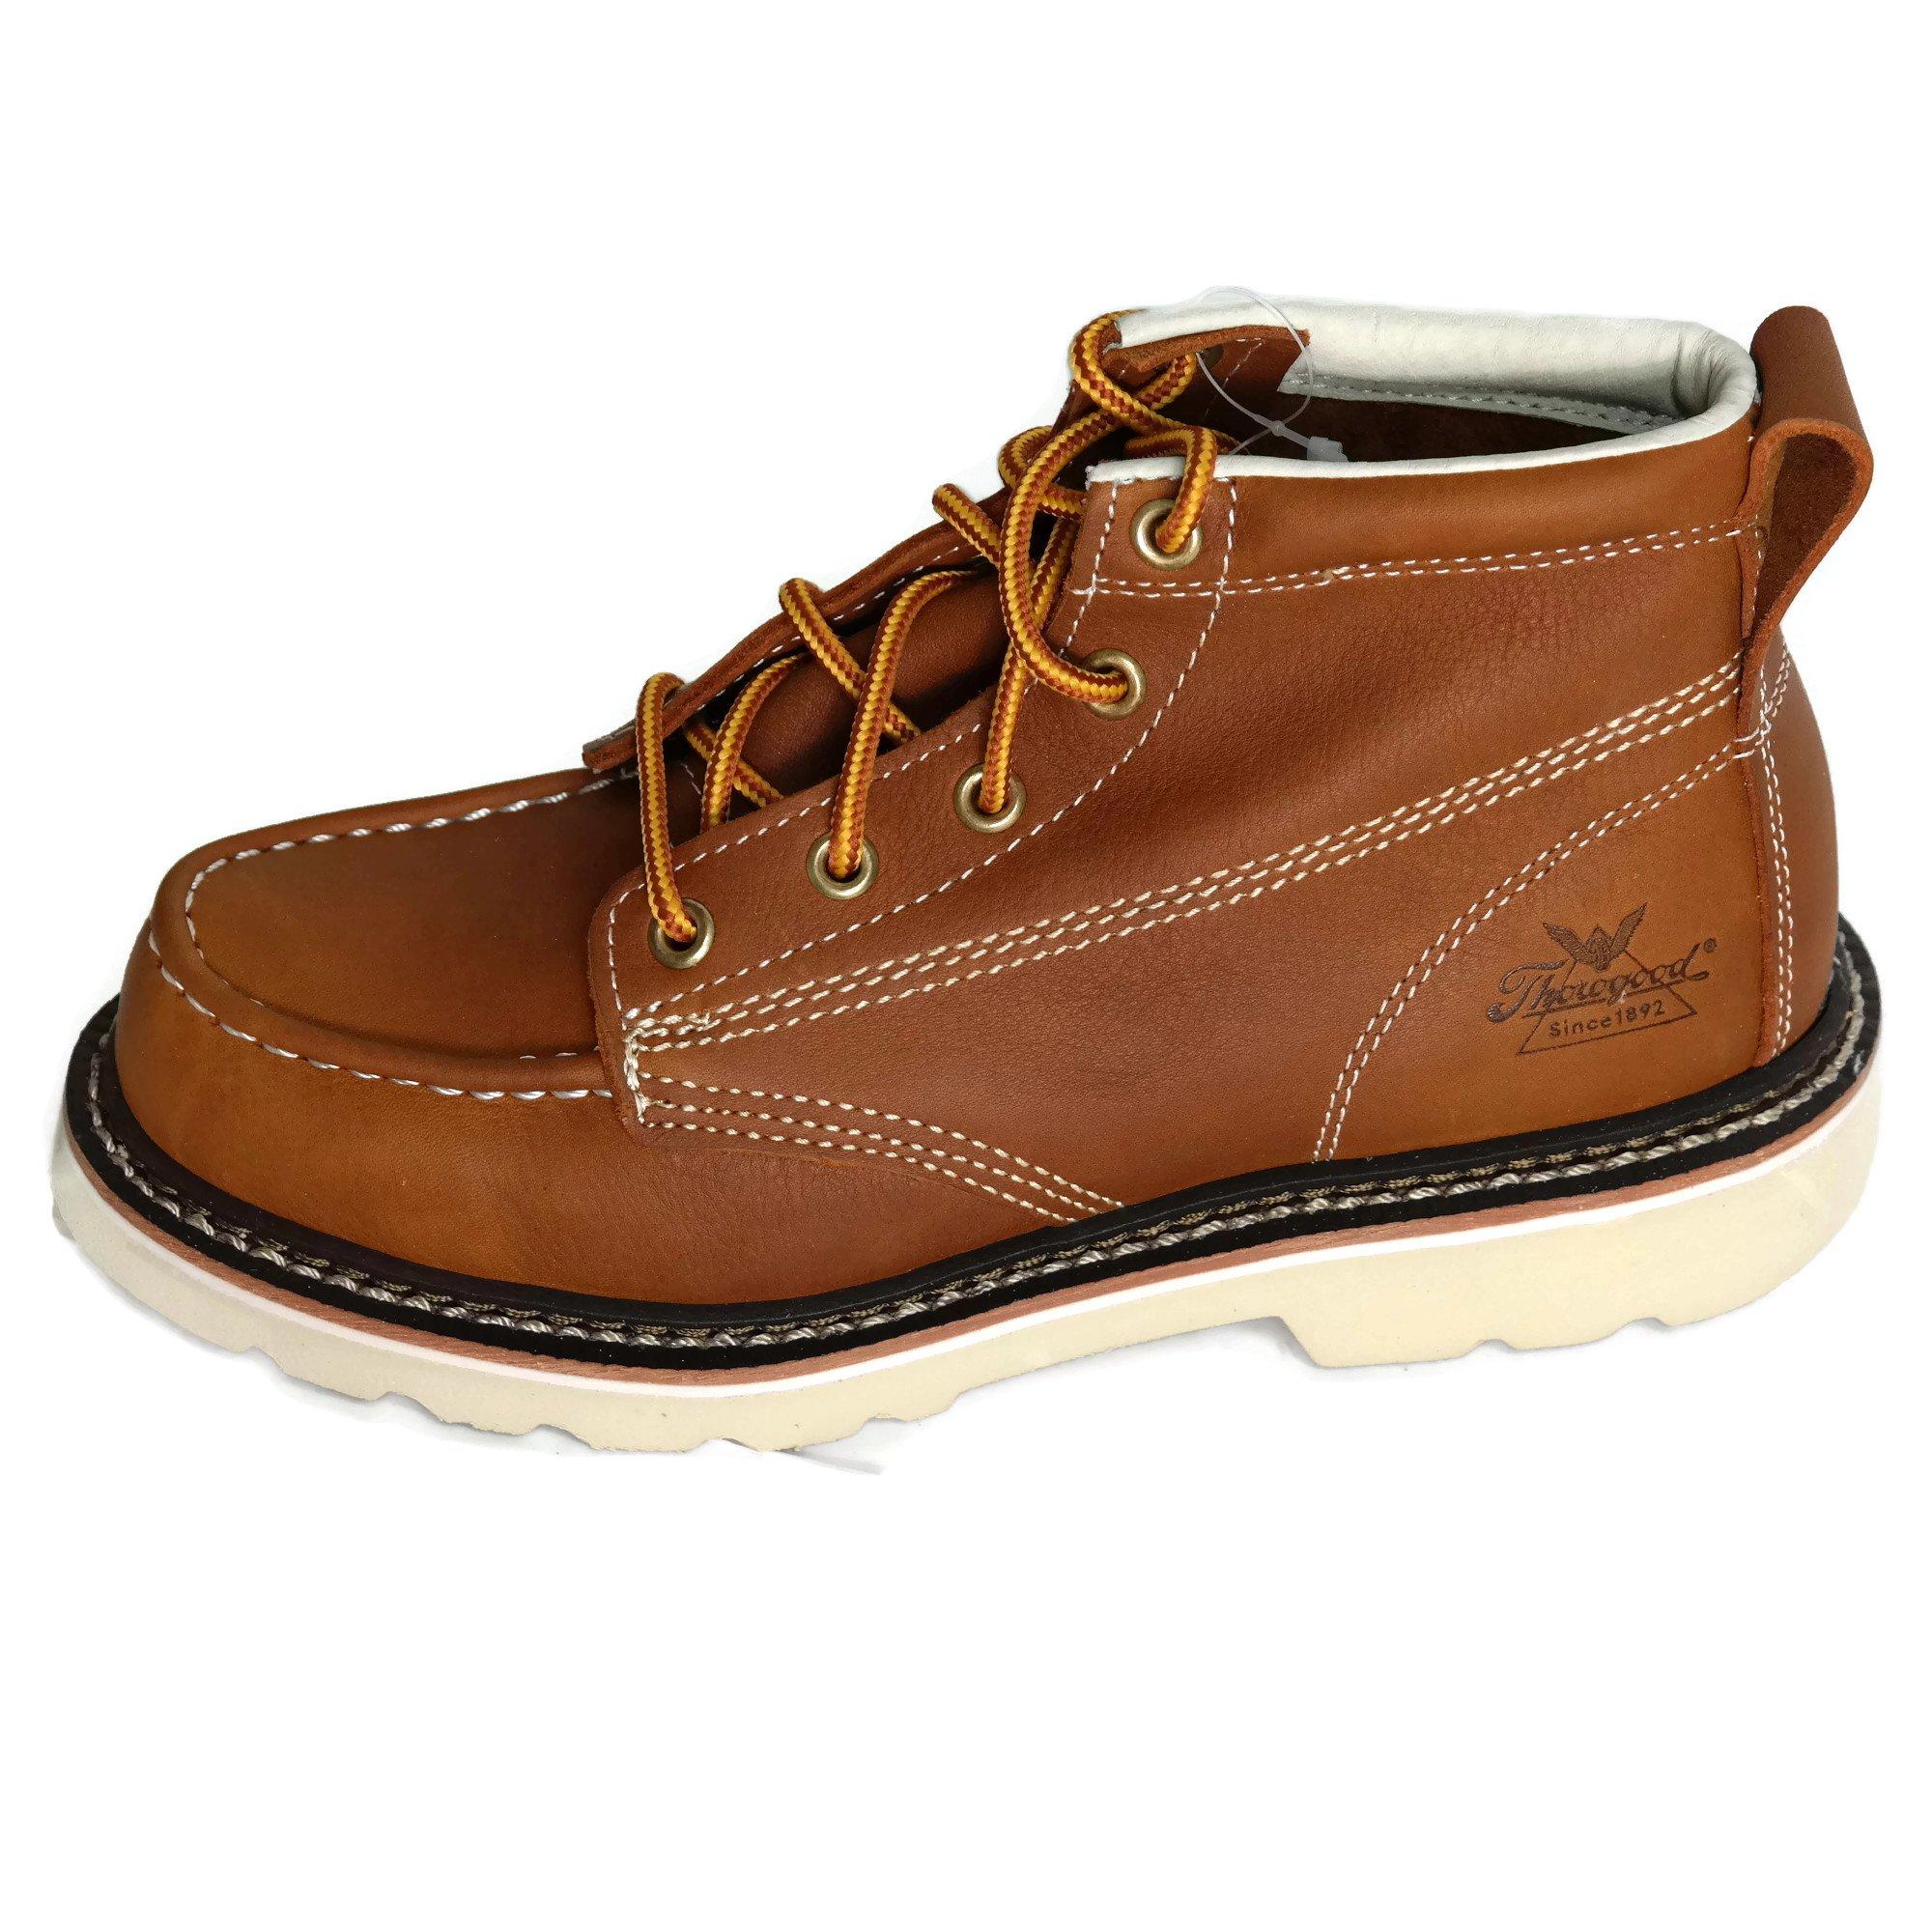 Thorogood Children and Youth Tucker Mudpie Brown Work Boots 314-4000 414-4000